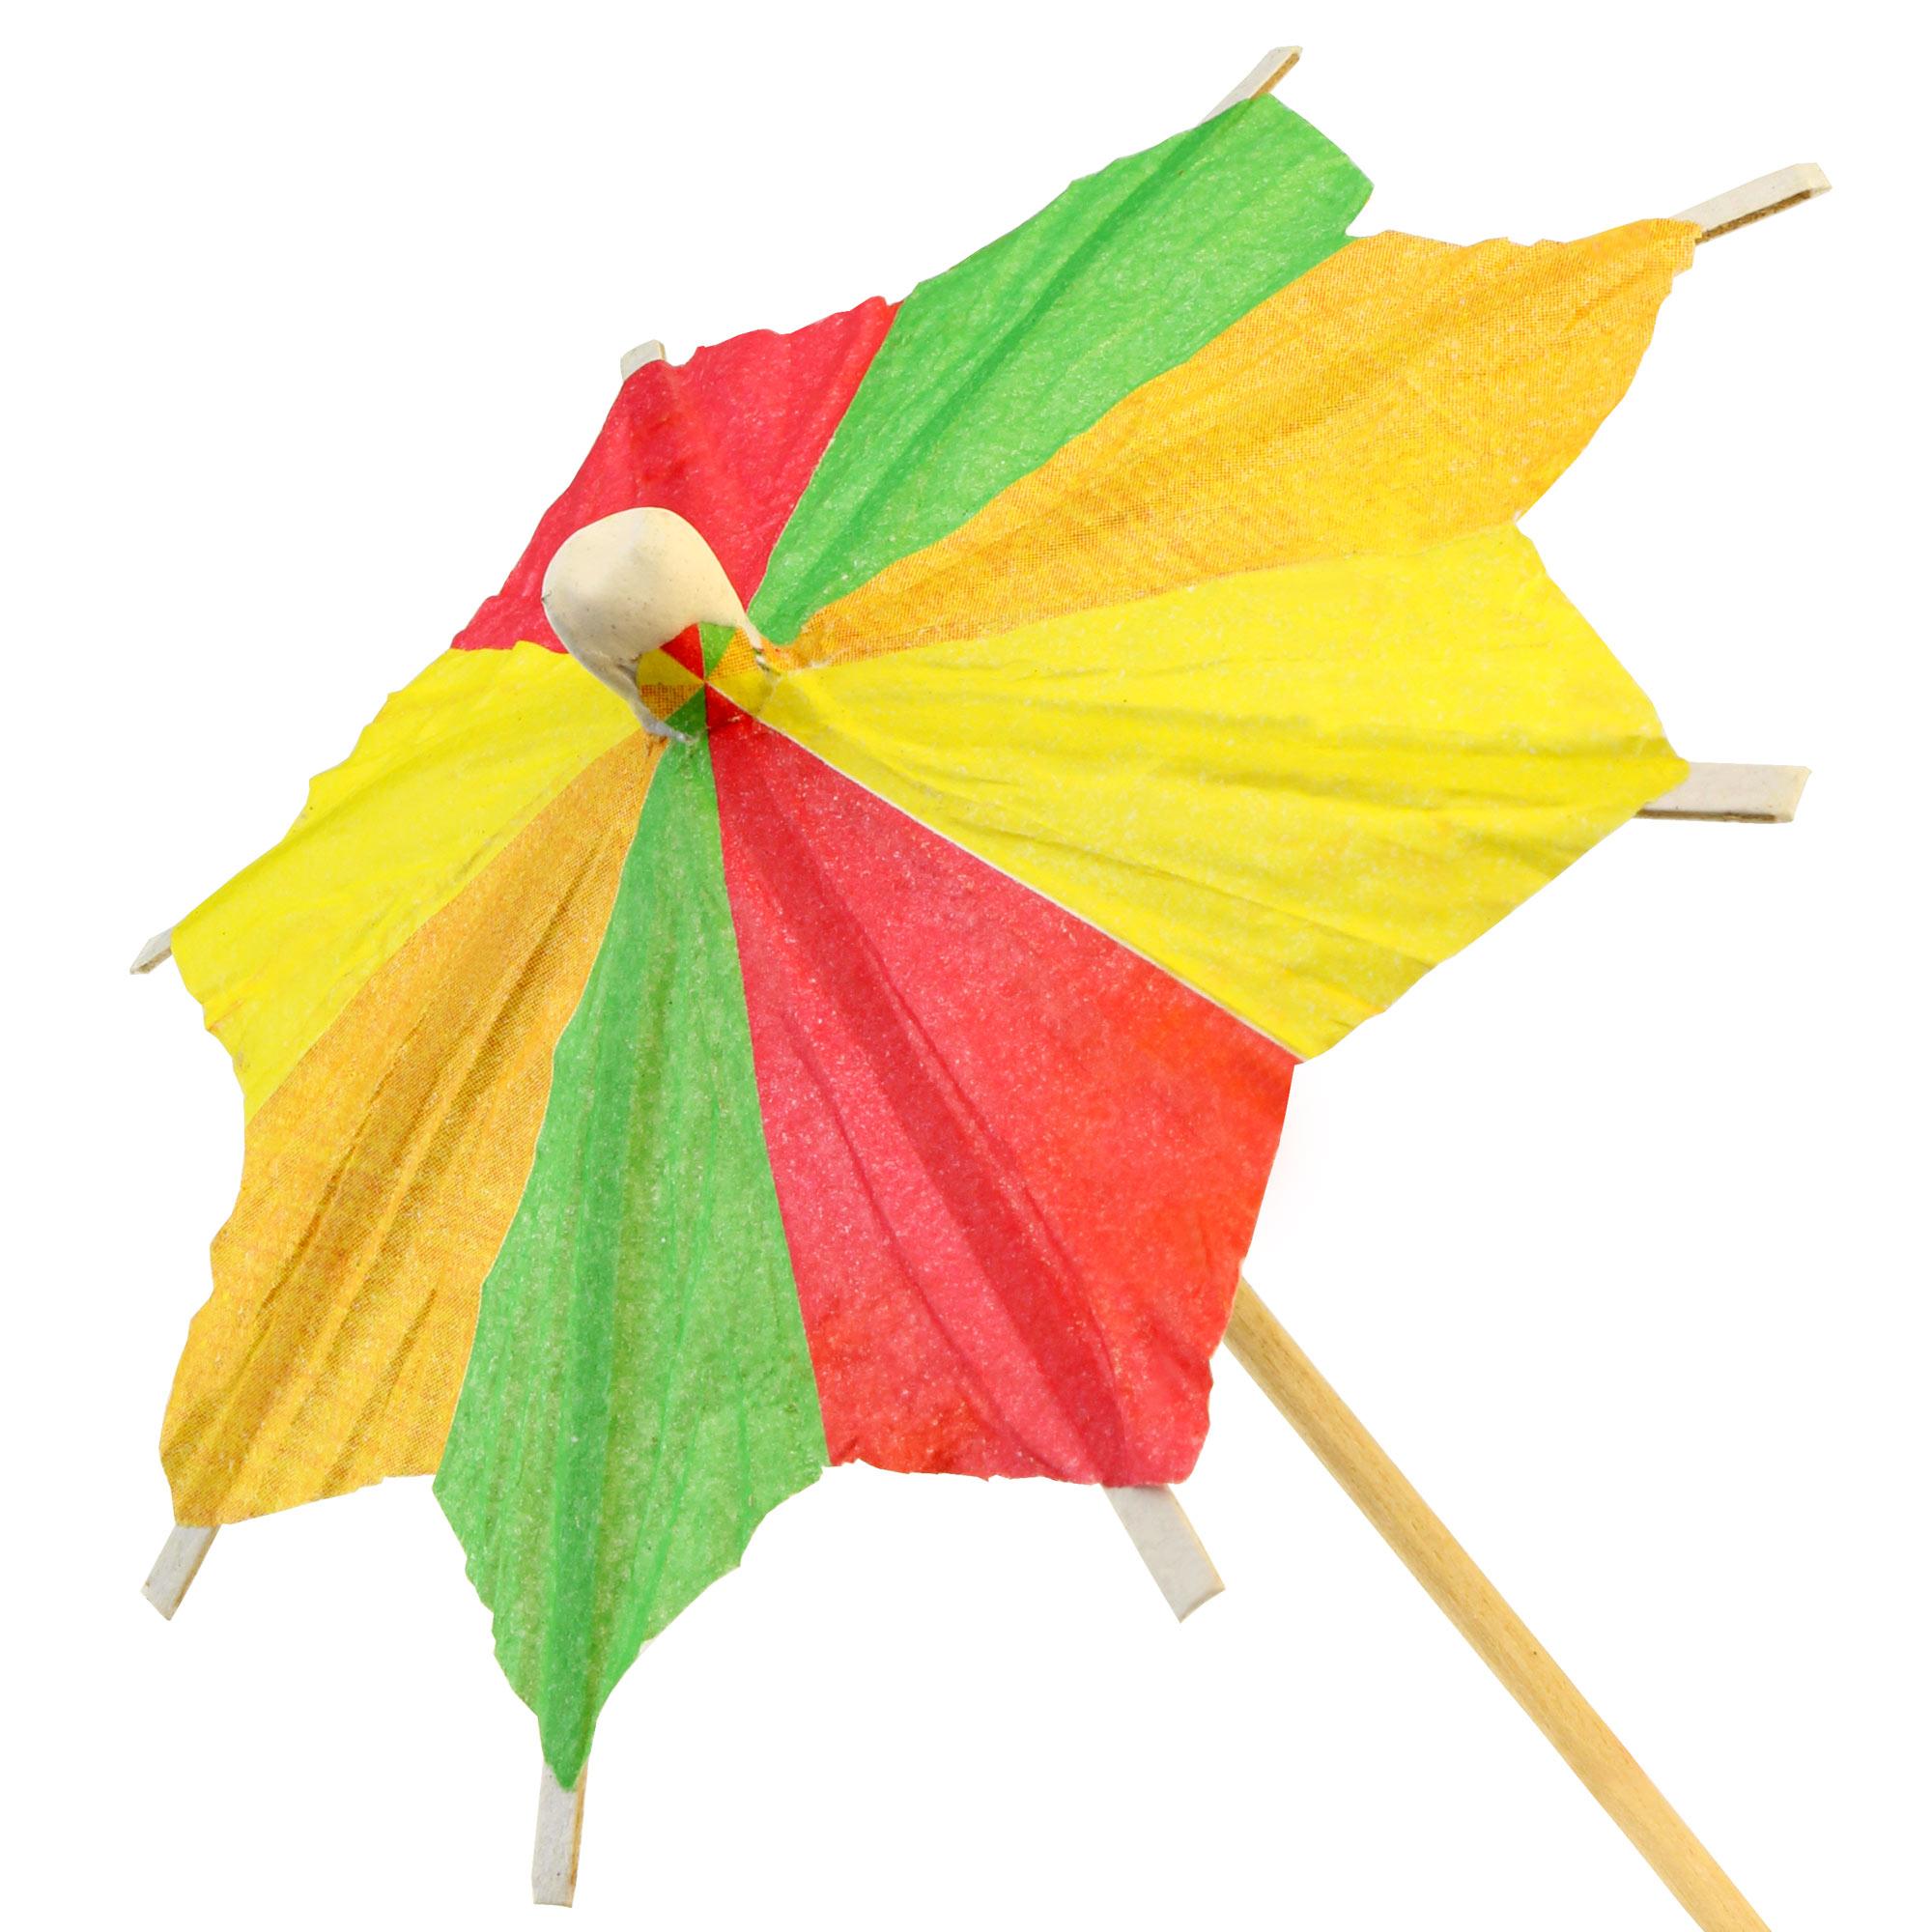 zick zack cocktail umbrellas paper parasol for cocktails